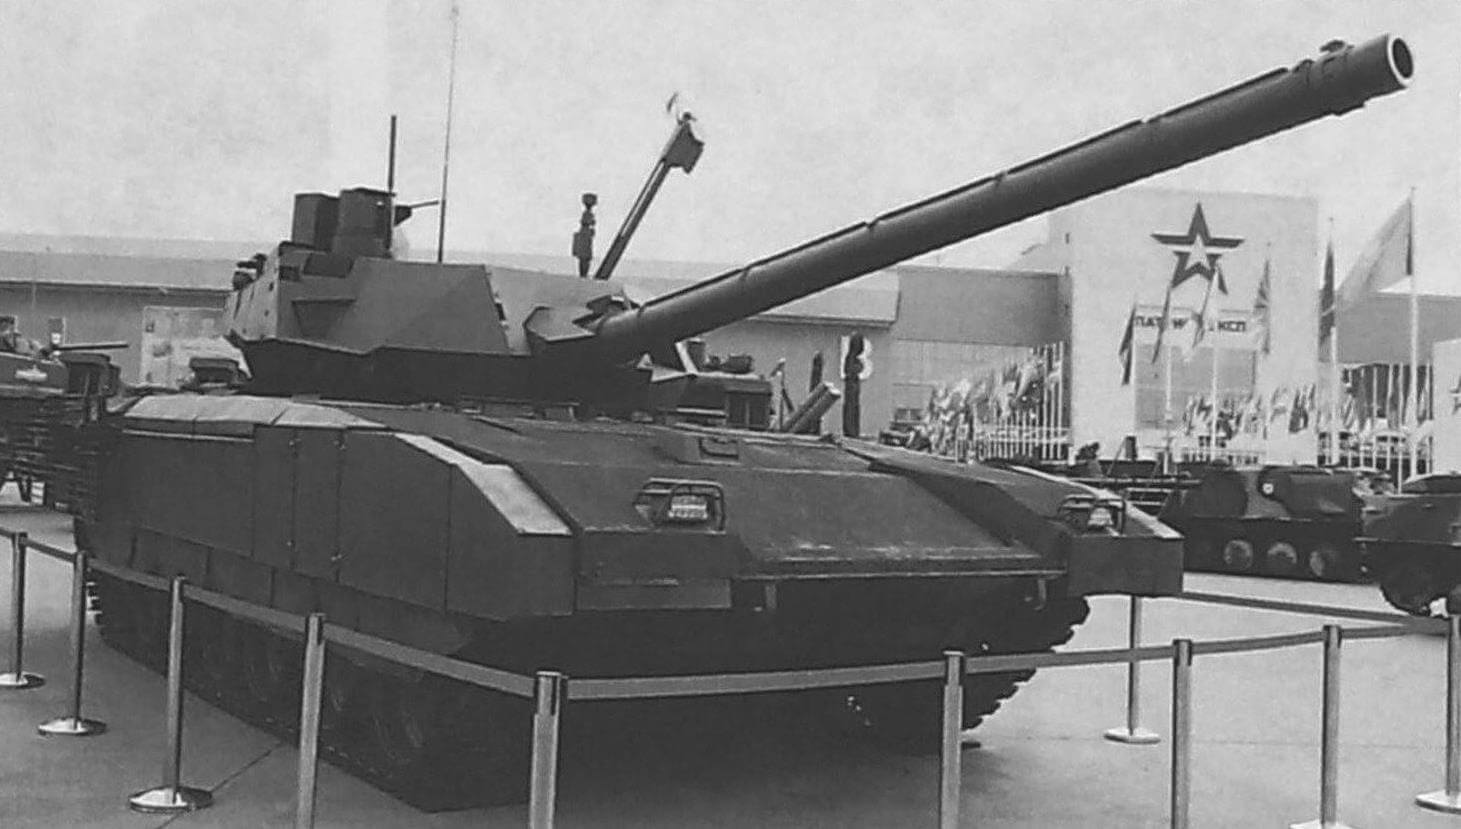 Перспективный боевой танк Т-14 «Армата»